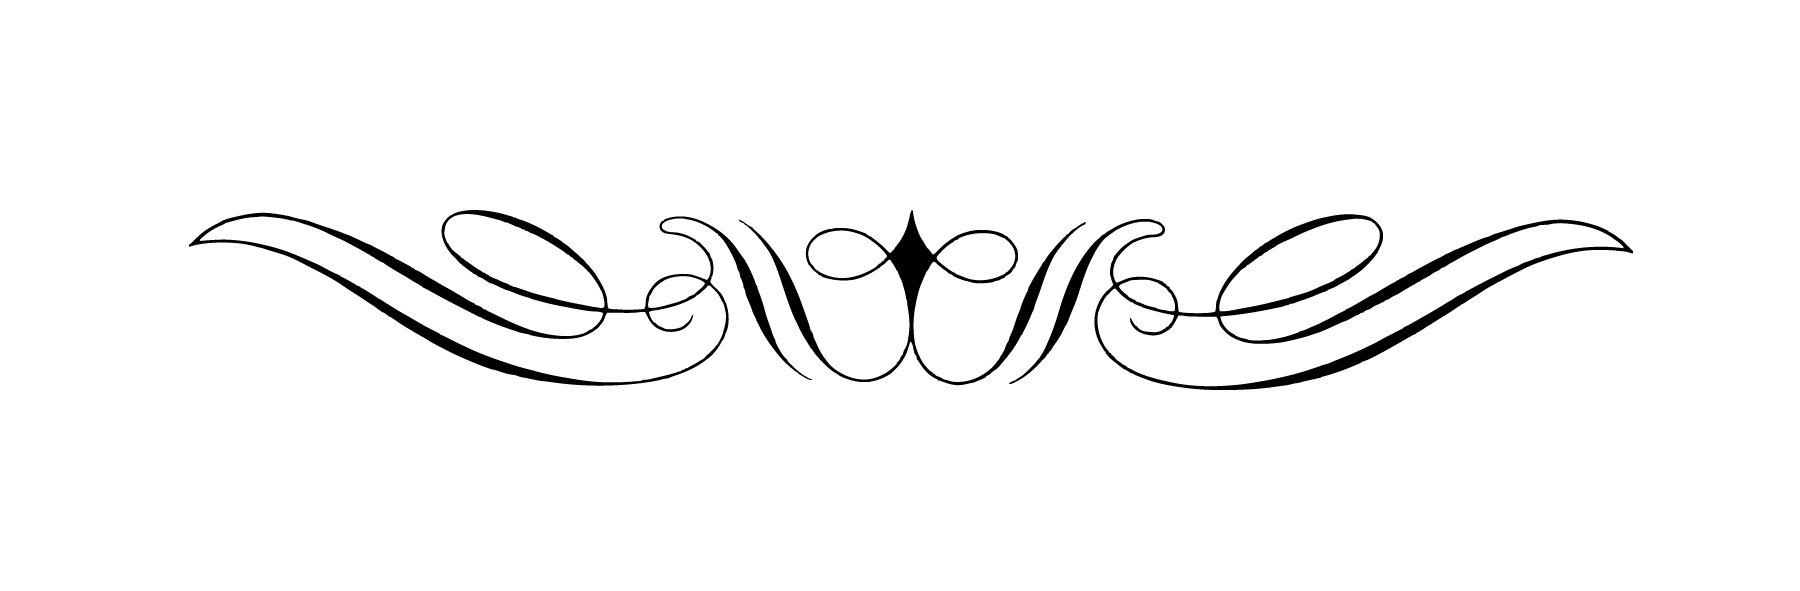 Book divider clipart clip art library download Curly Art Nouveau Divider transparent PNG - StickPNG clip art library download